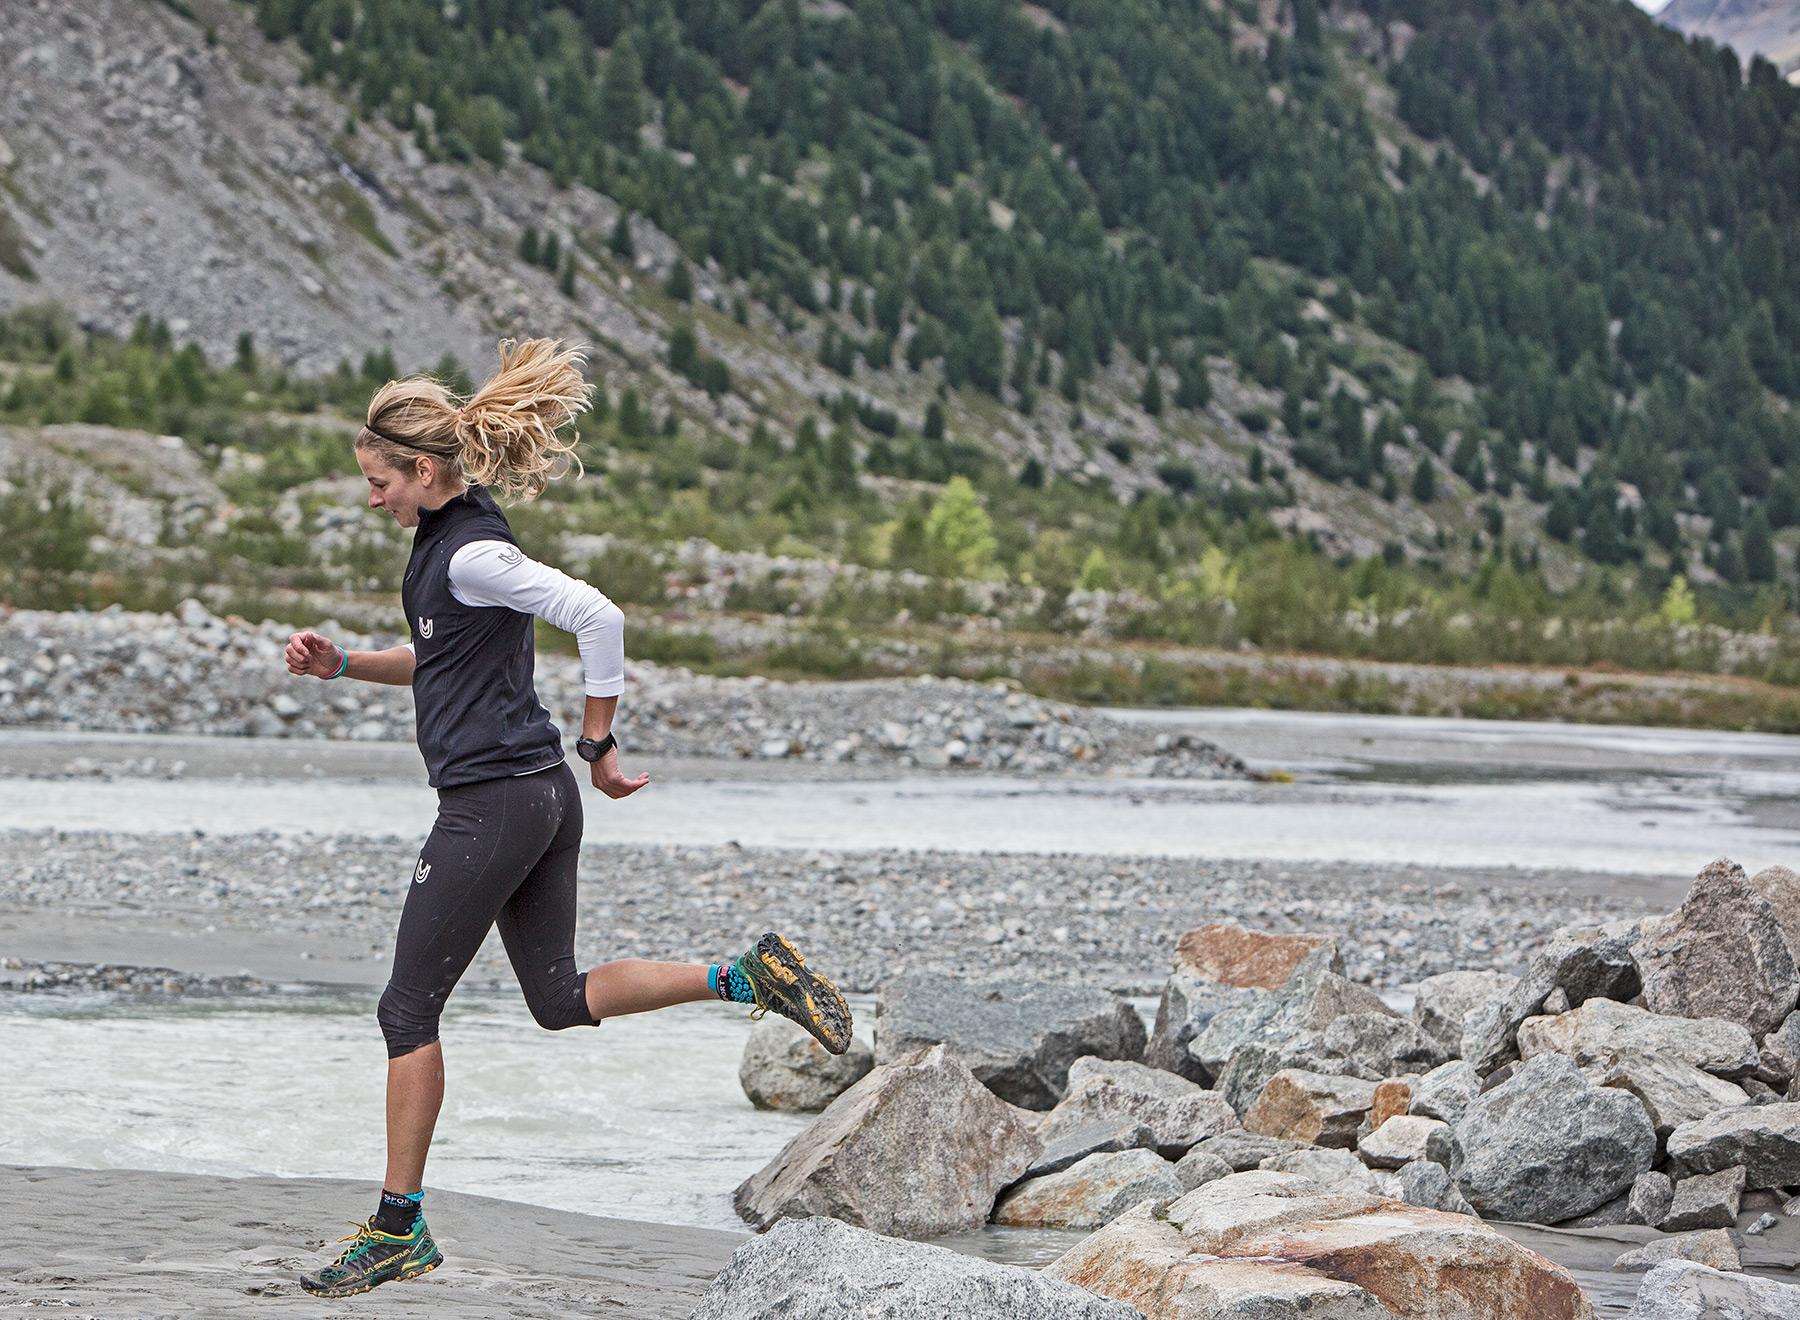 11-UVU-Anne-Marie-Flammersfeld-Running-Engadin